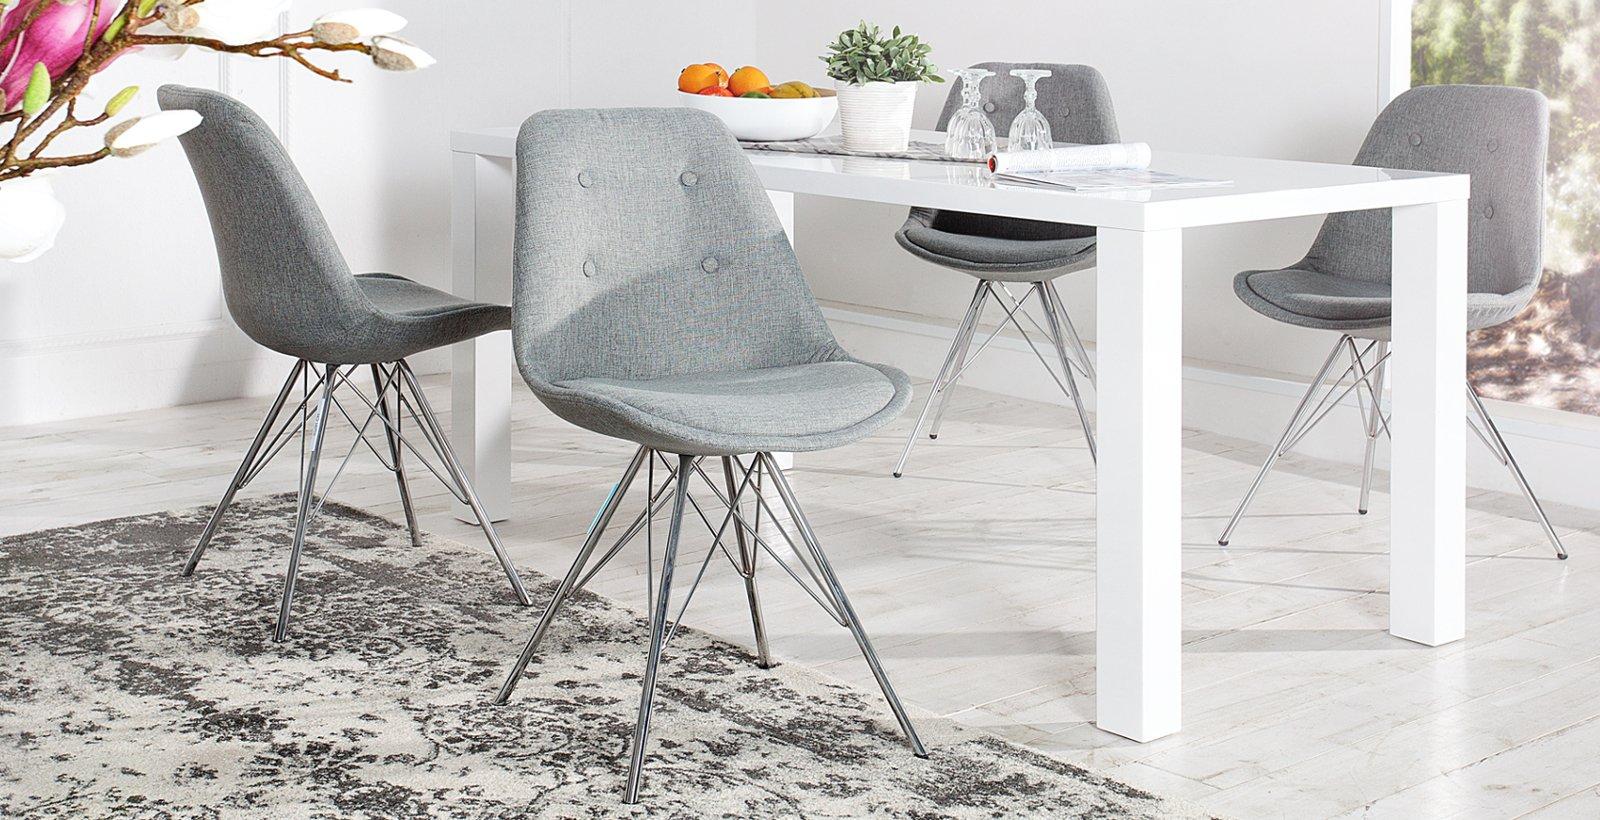 Retro Designklassiker Stuhl SCANIA MEISTERSTÜCK II grau mit Gestell aus Chrom